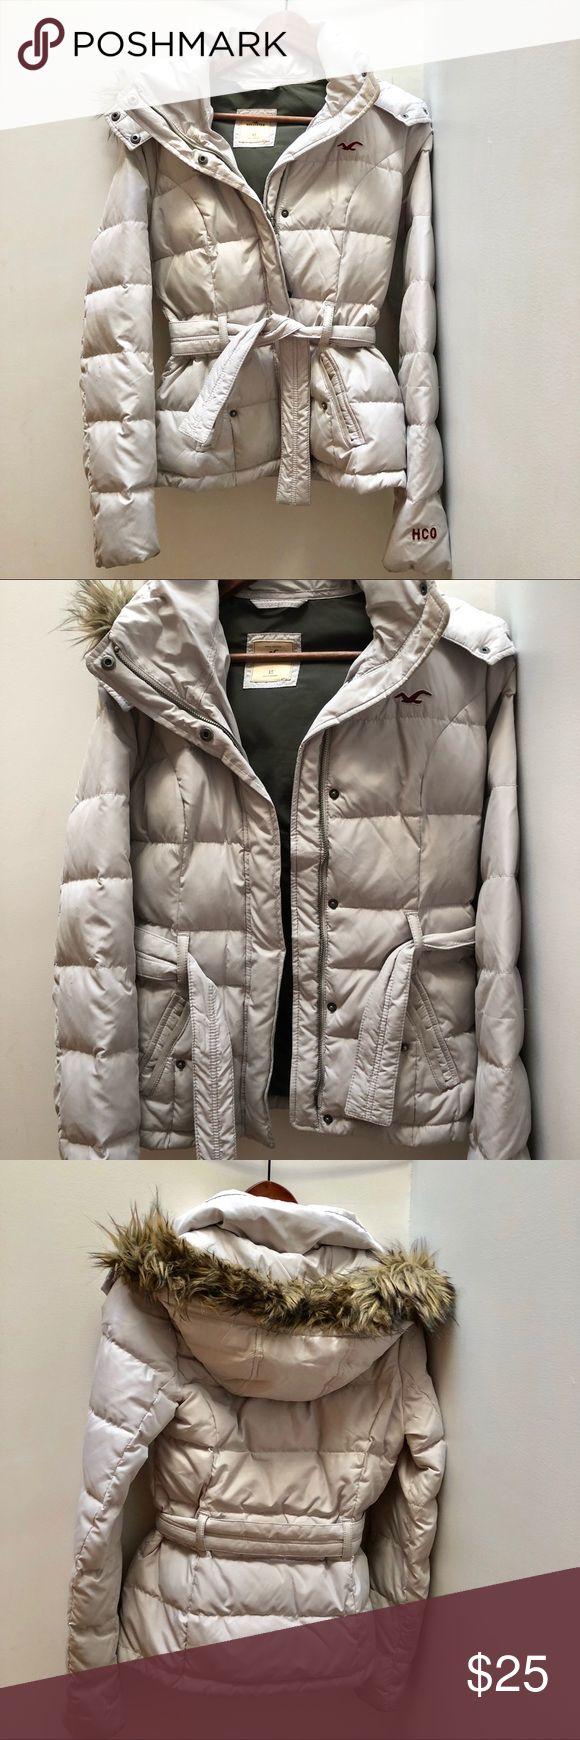 Hollister coats Size: XS Color: Silver Jackets & Coats